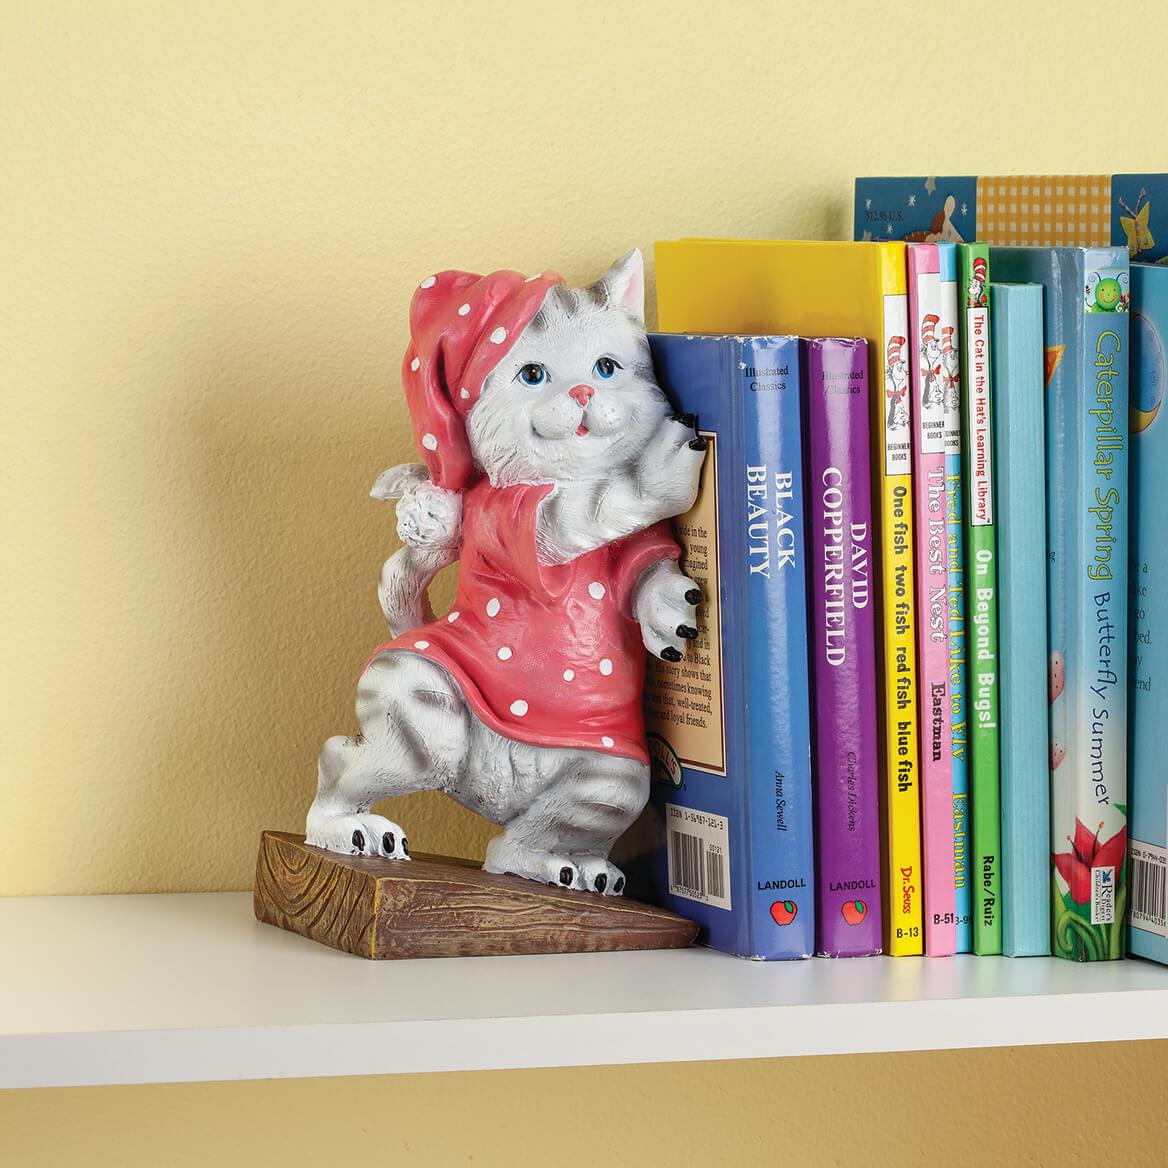 Whimsy Kitty Resin Doorstop-369627